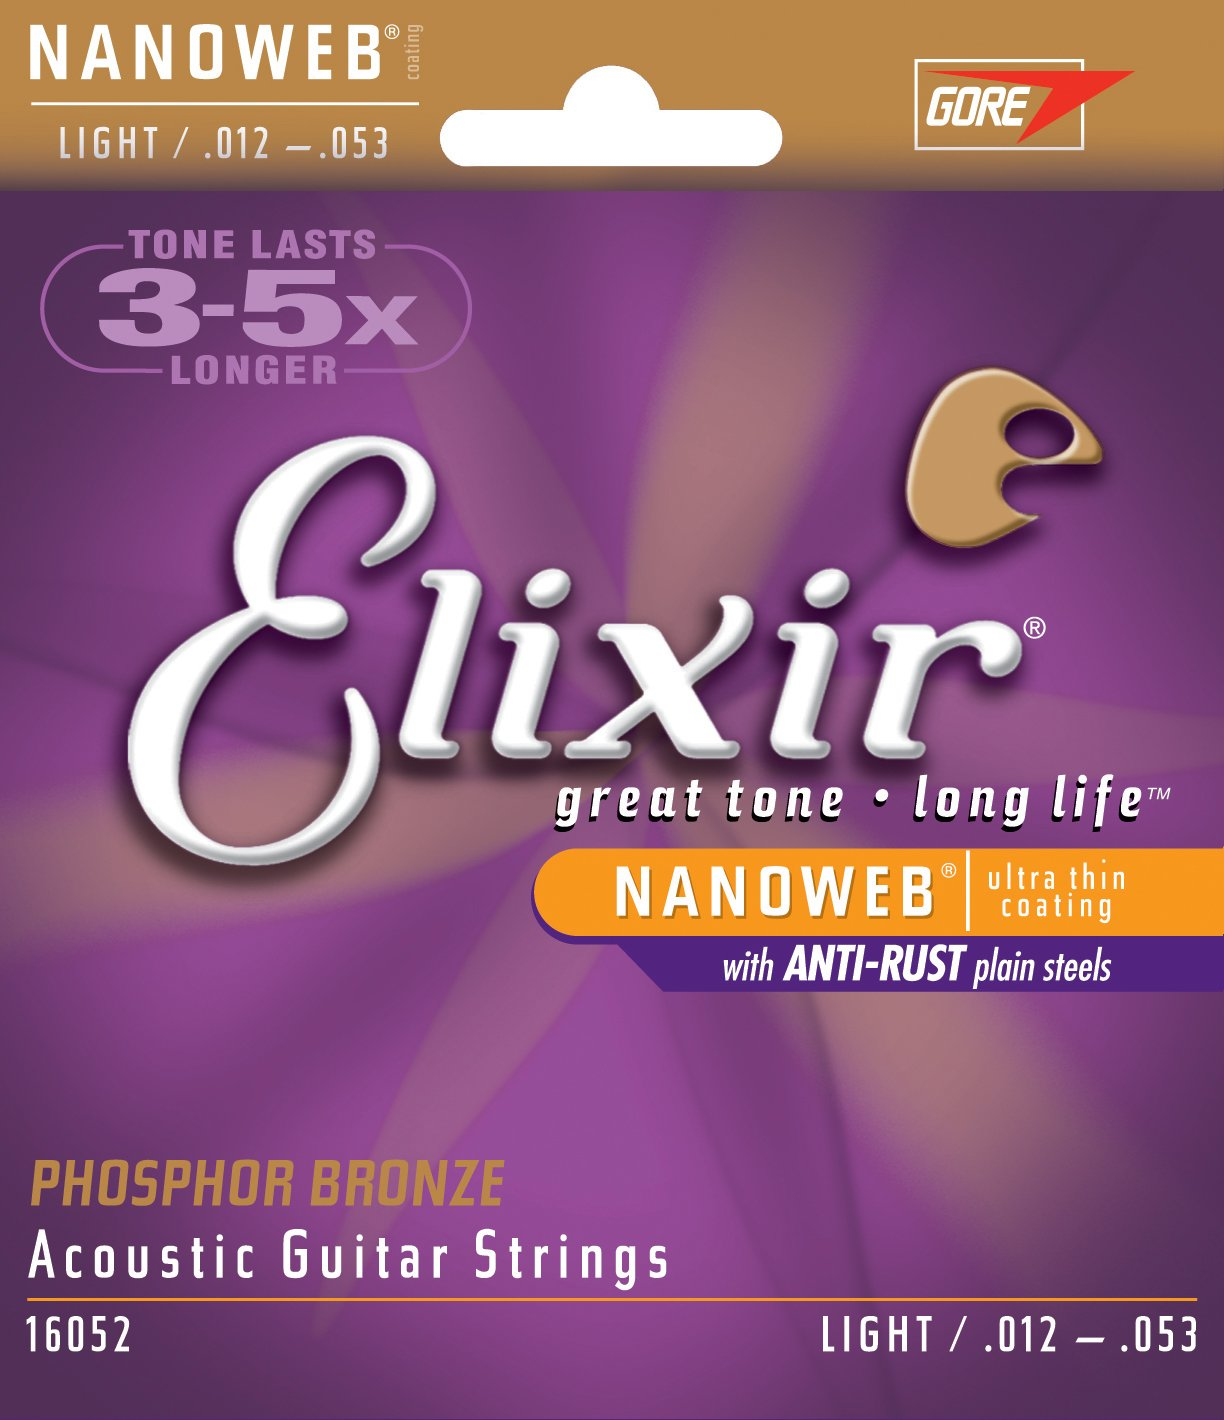 Elixir 80/20 12-53 Bronze Nanoweb Coating Custom Light Acoustic Guitar Strings